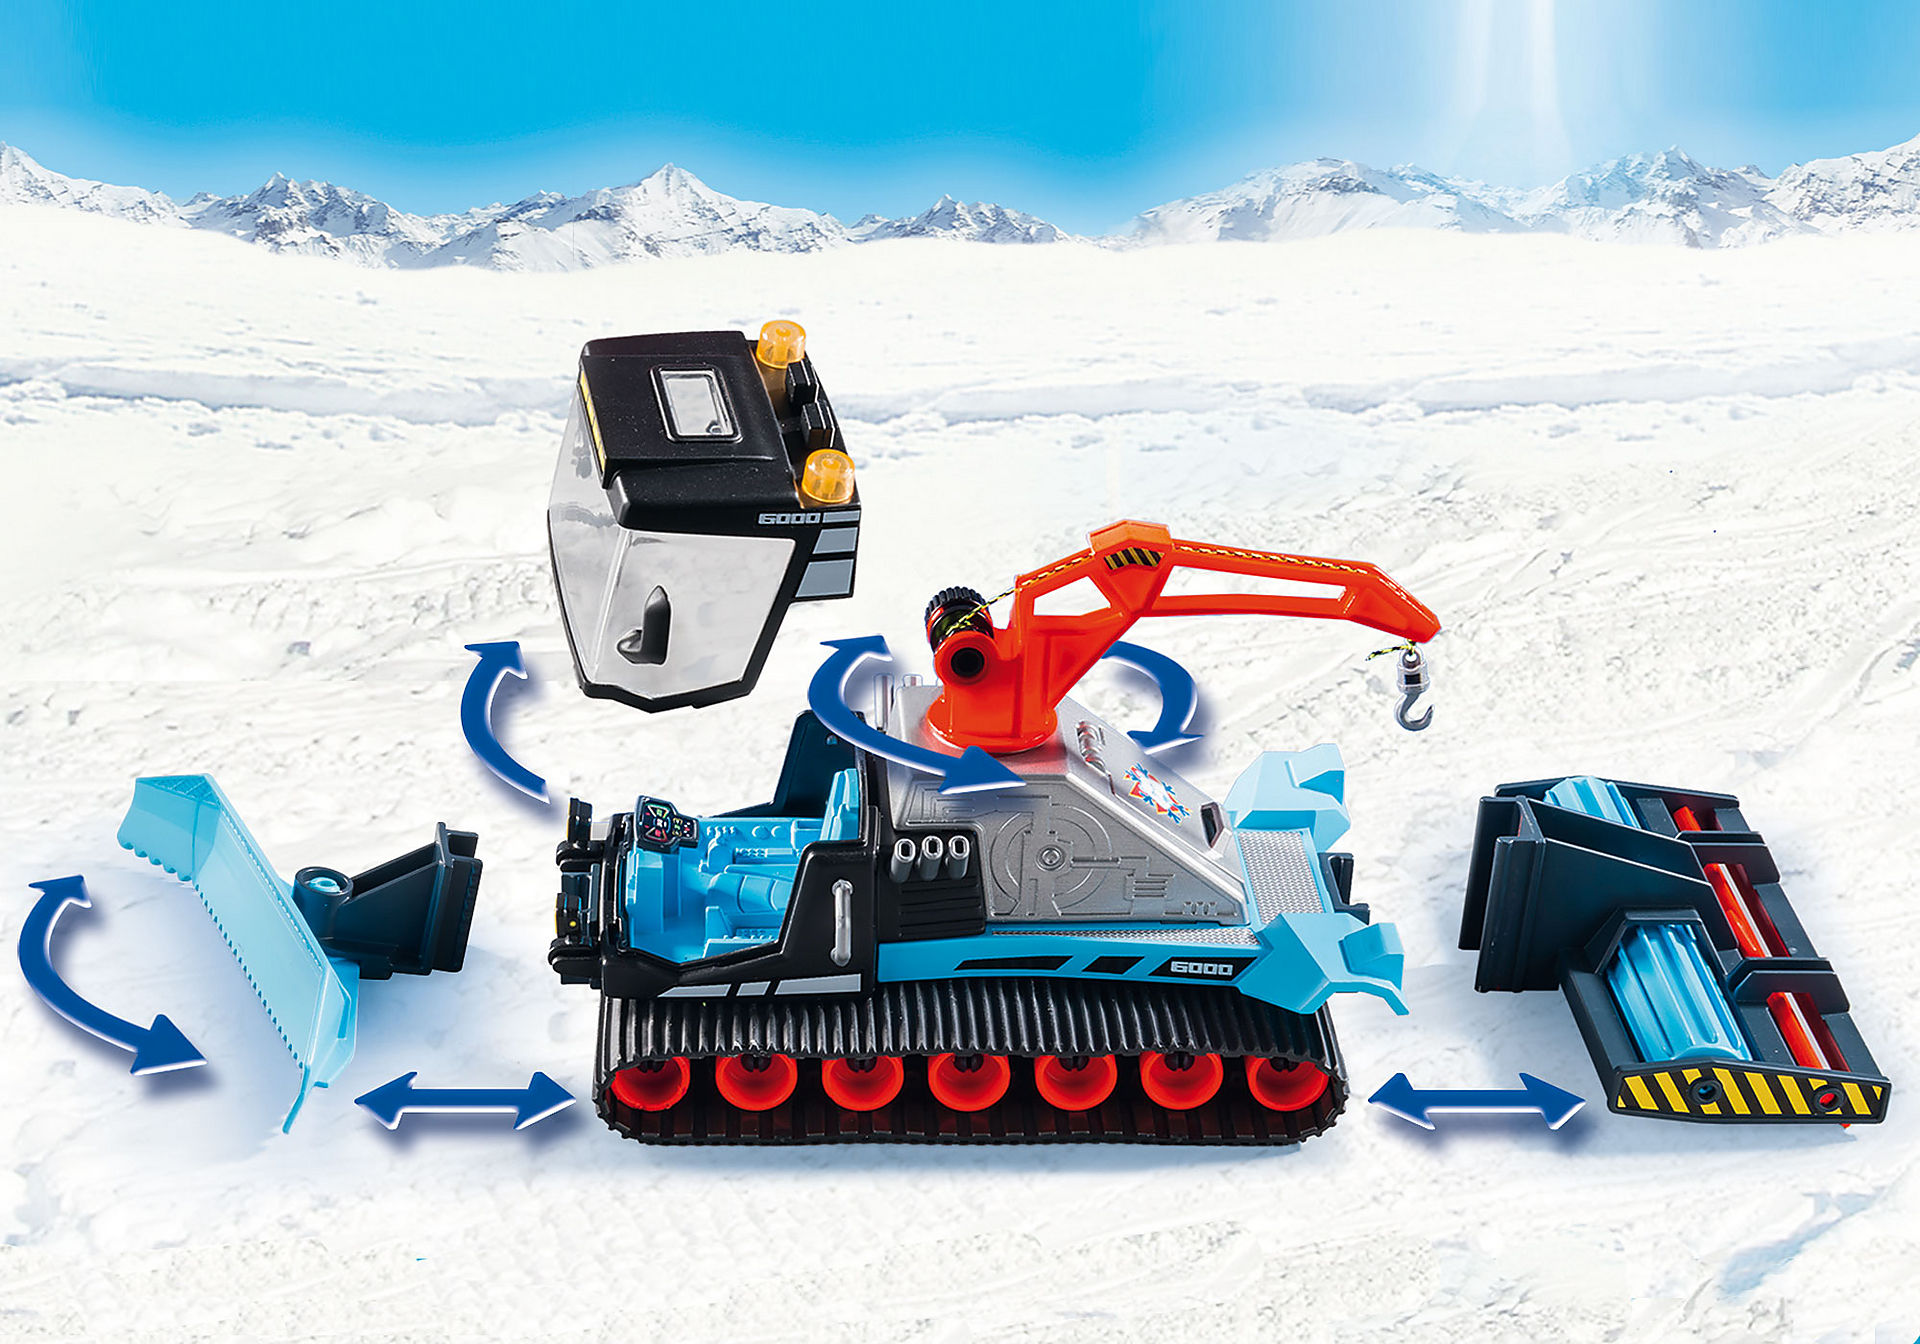 http://media.playmobil.com/i/playmobil/9500_product_extra2/Όχημα χιονιού με ερπύστριες